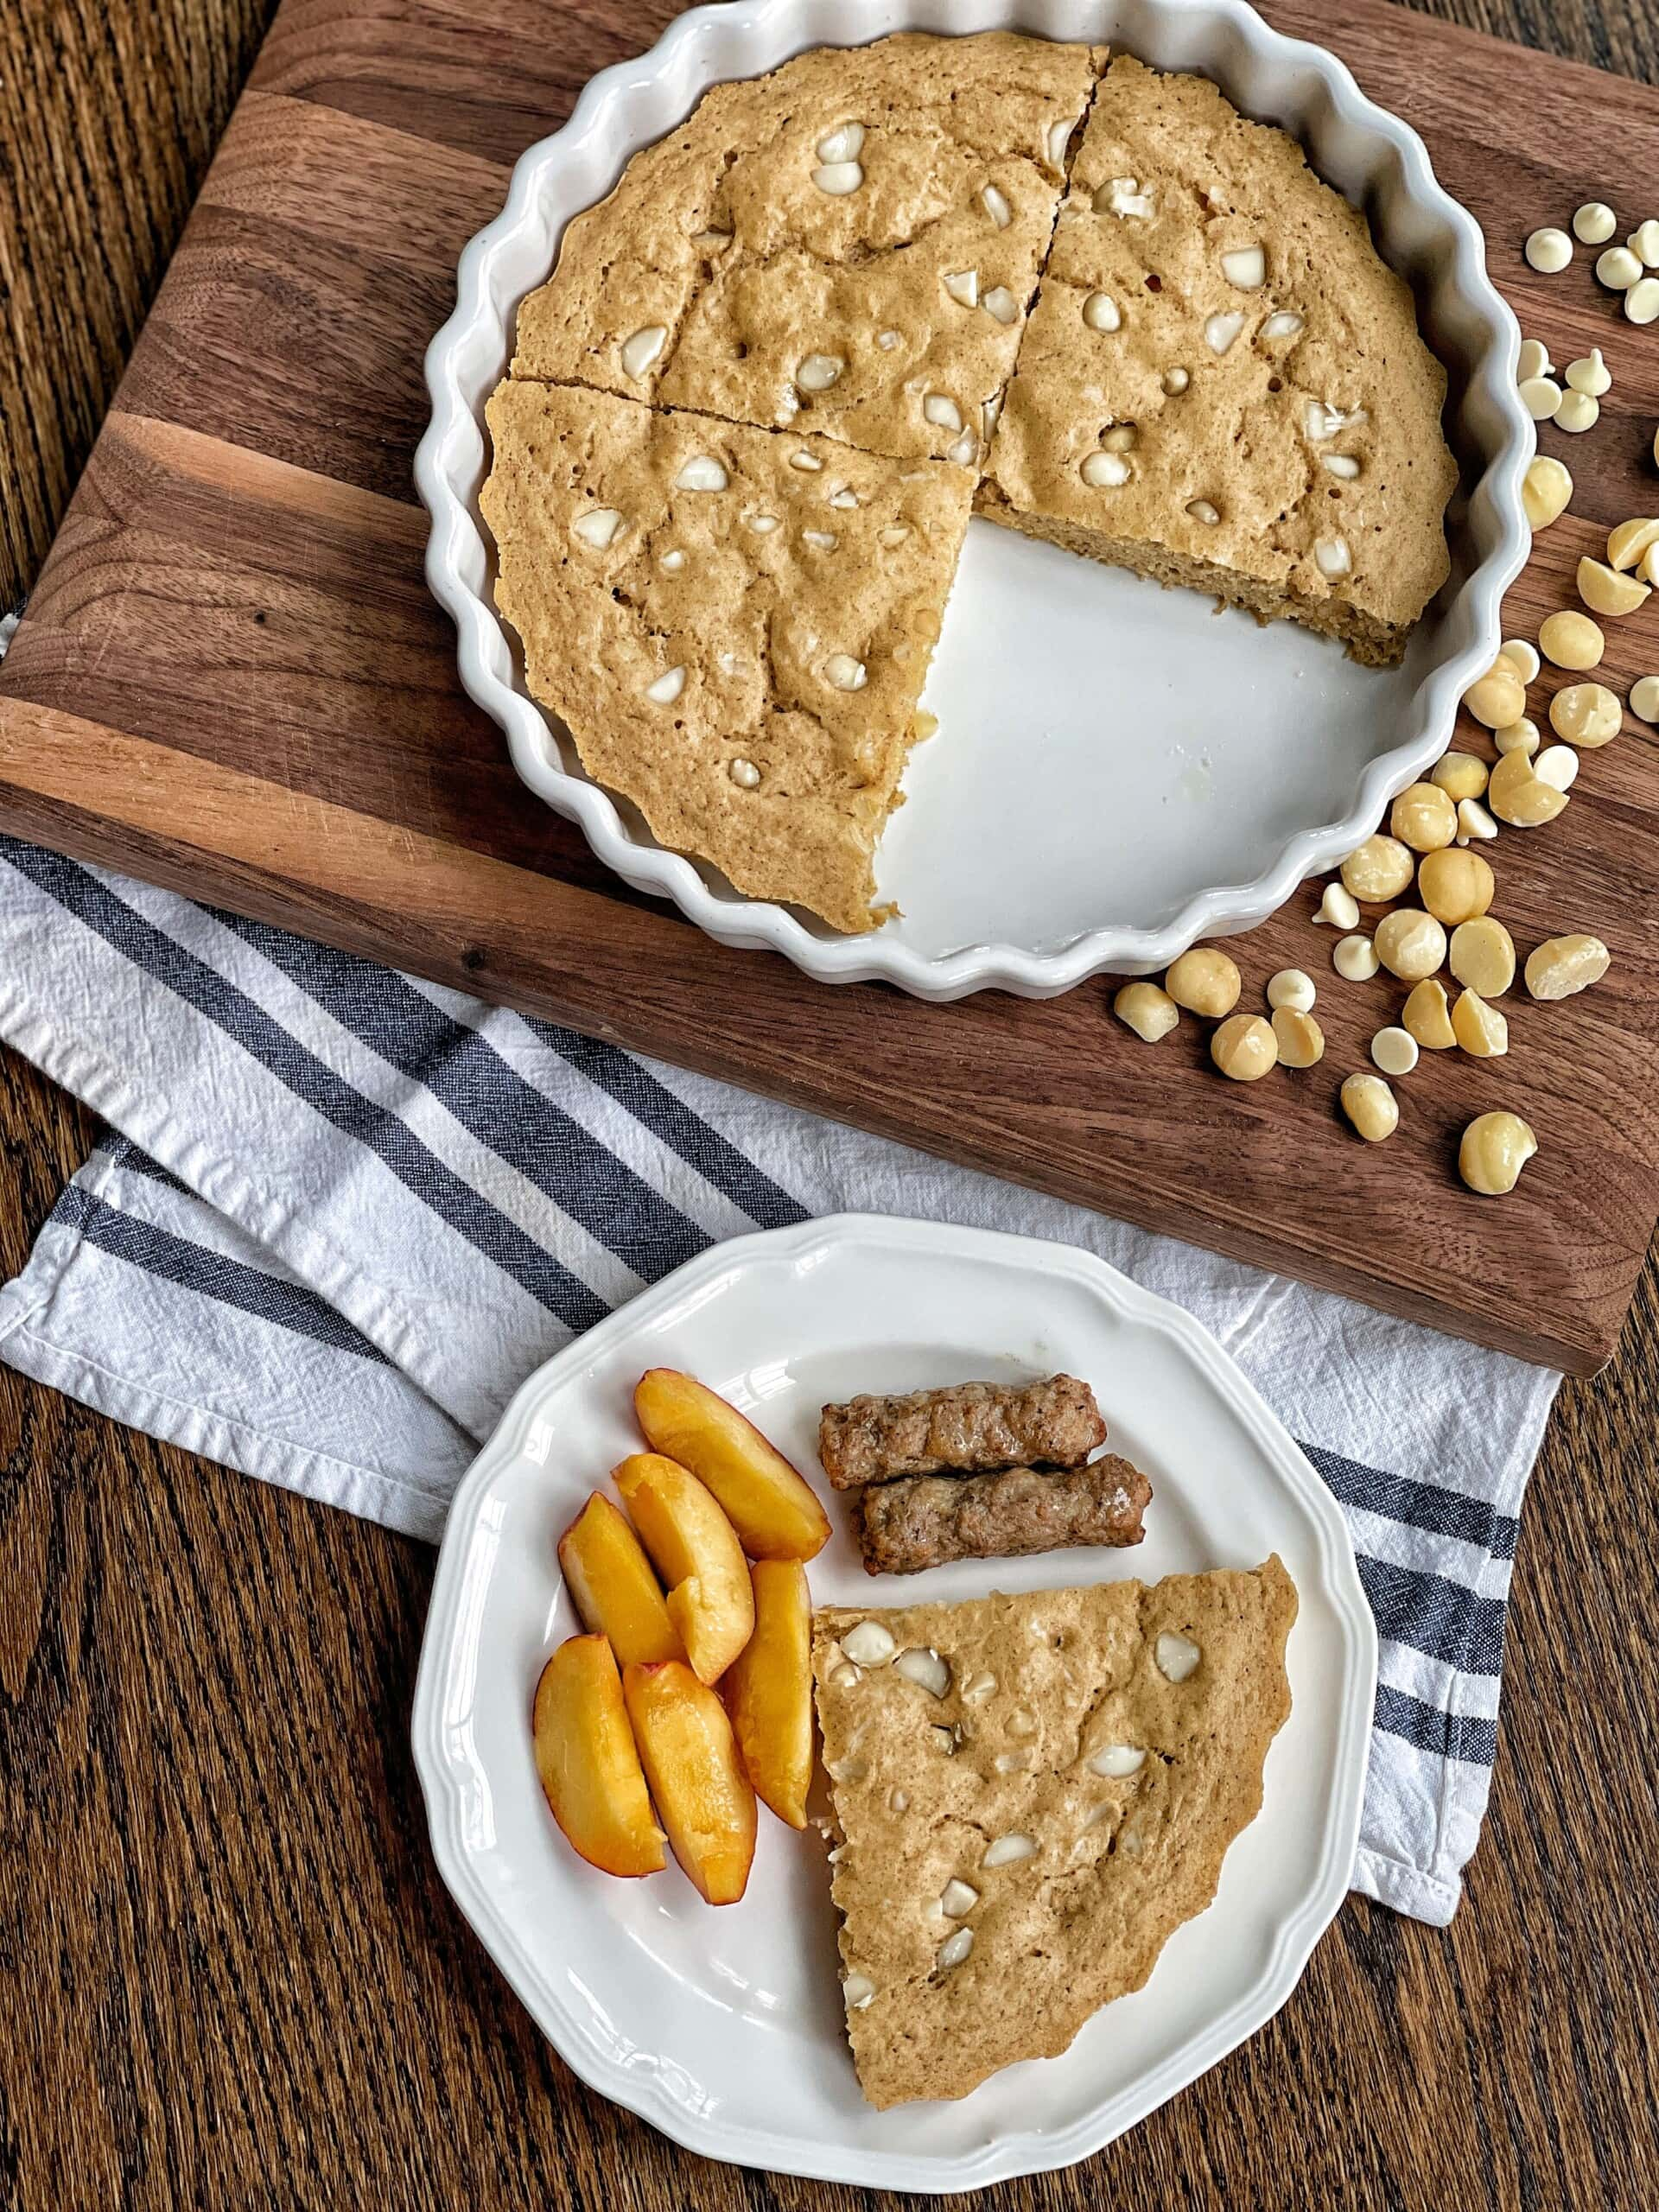 macadamia pancake bake